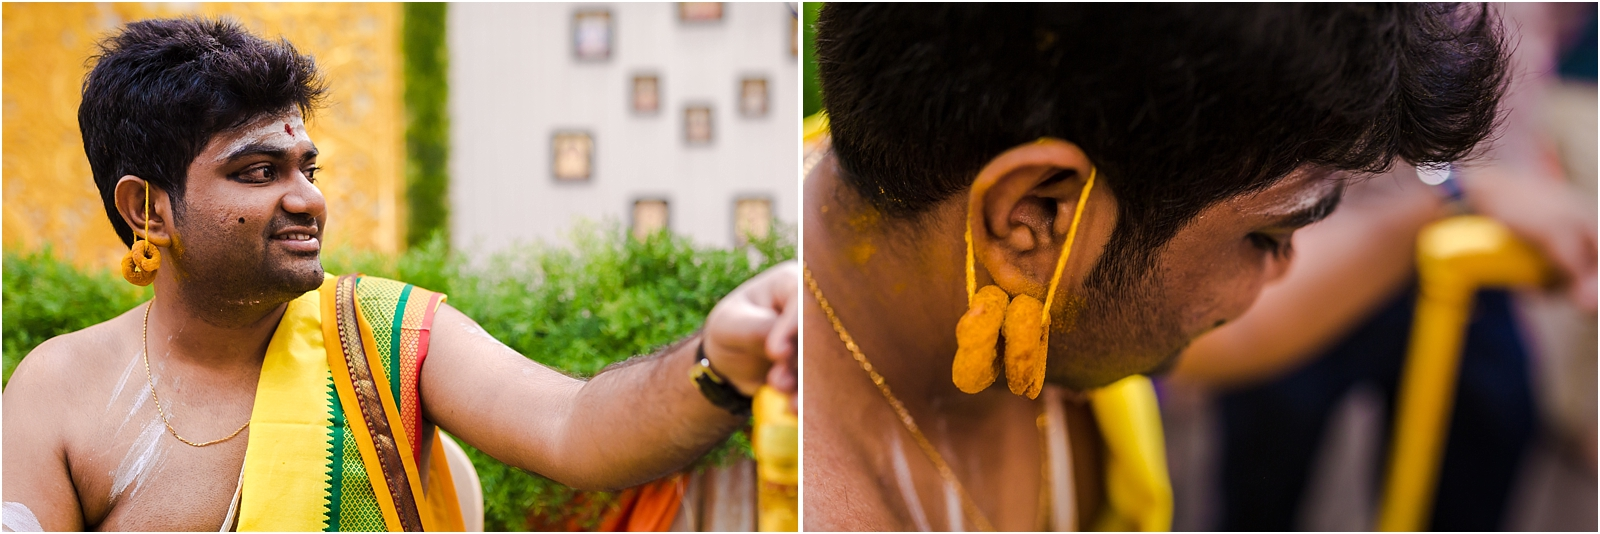 13042017-Achu-Deepthi-Engagement-Sangeeth-212.jpg